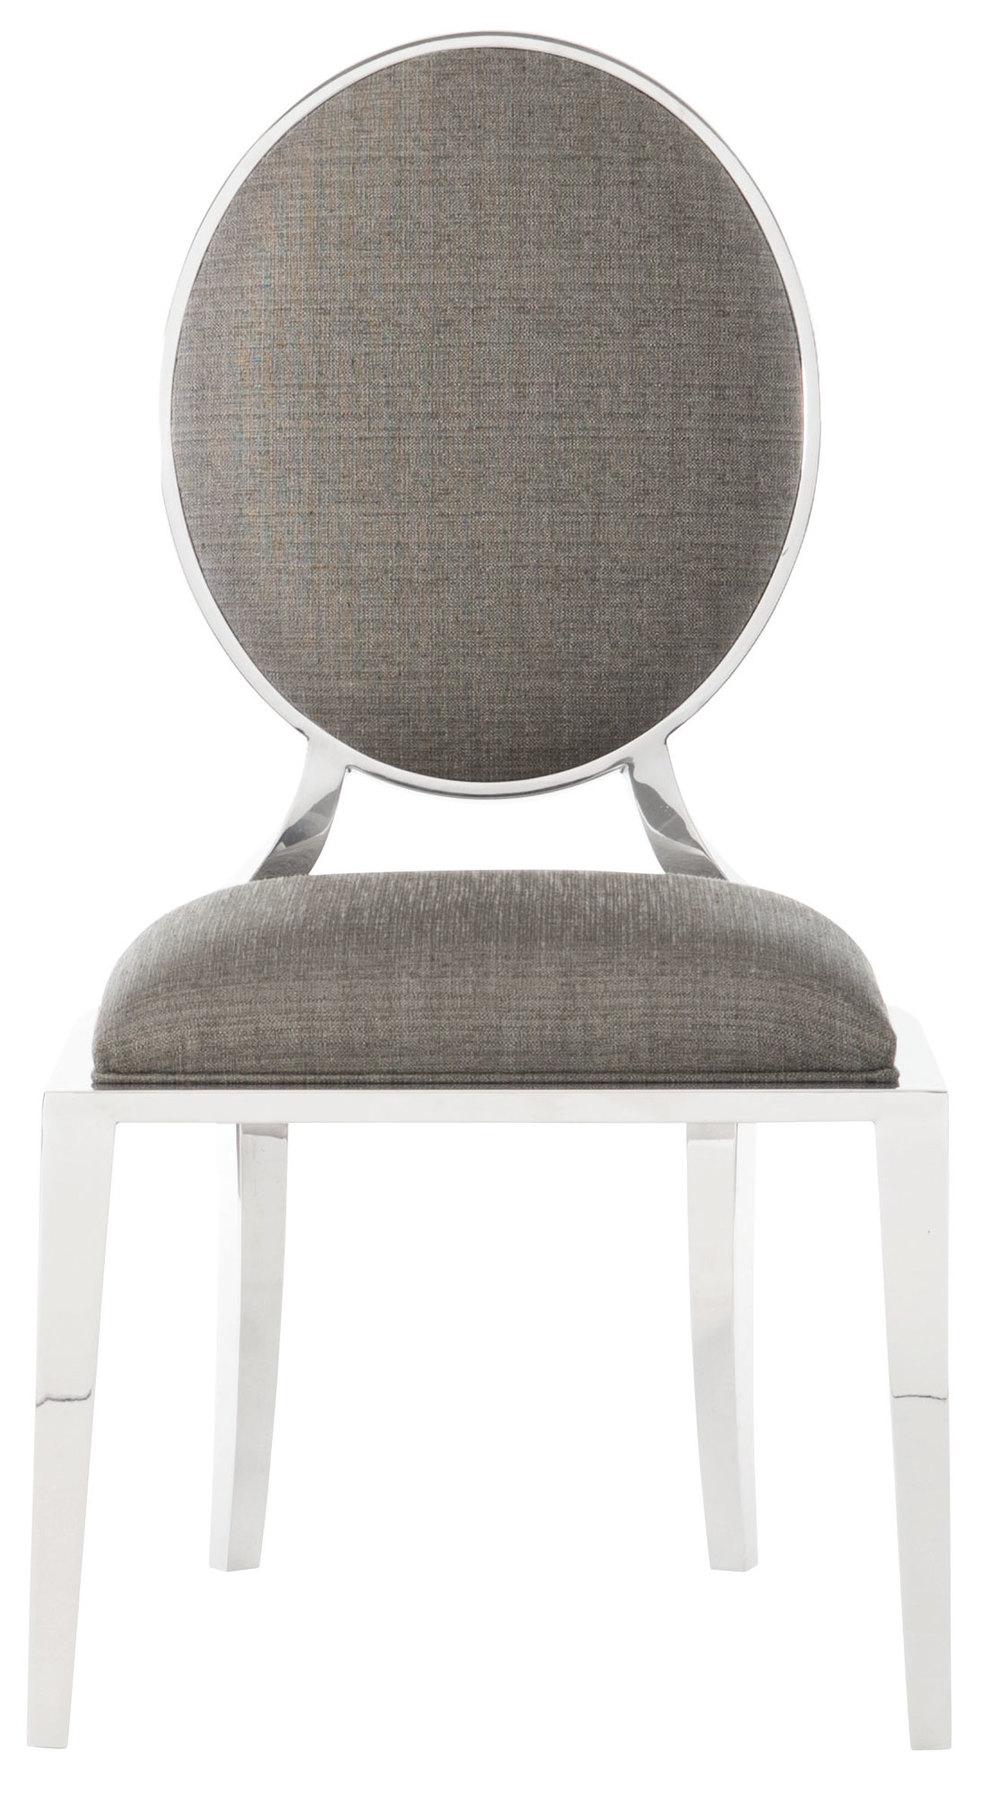 Bernhardt - Percival Metal Side Chair